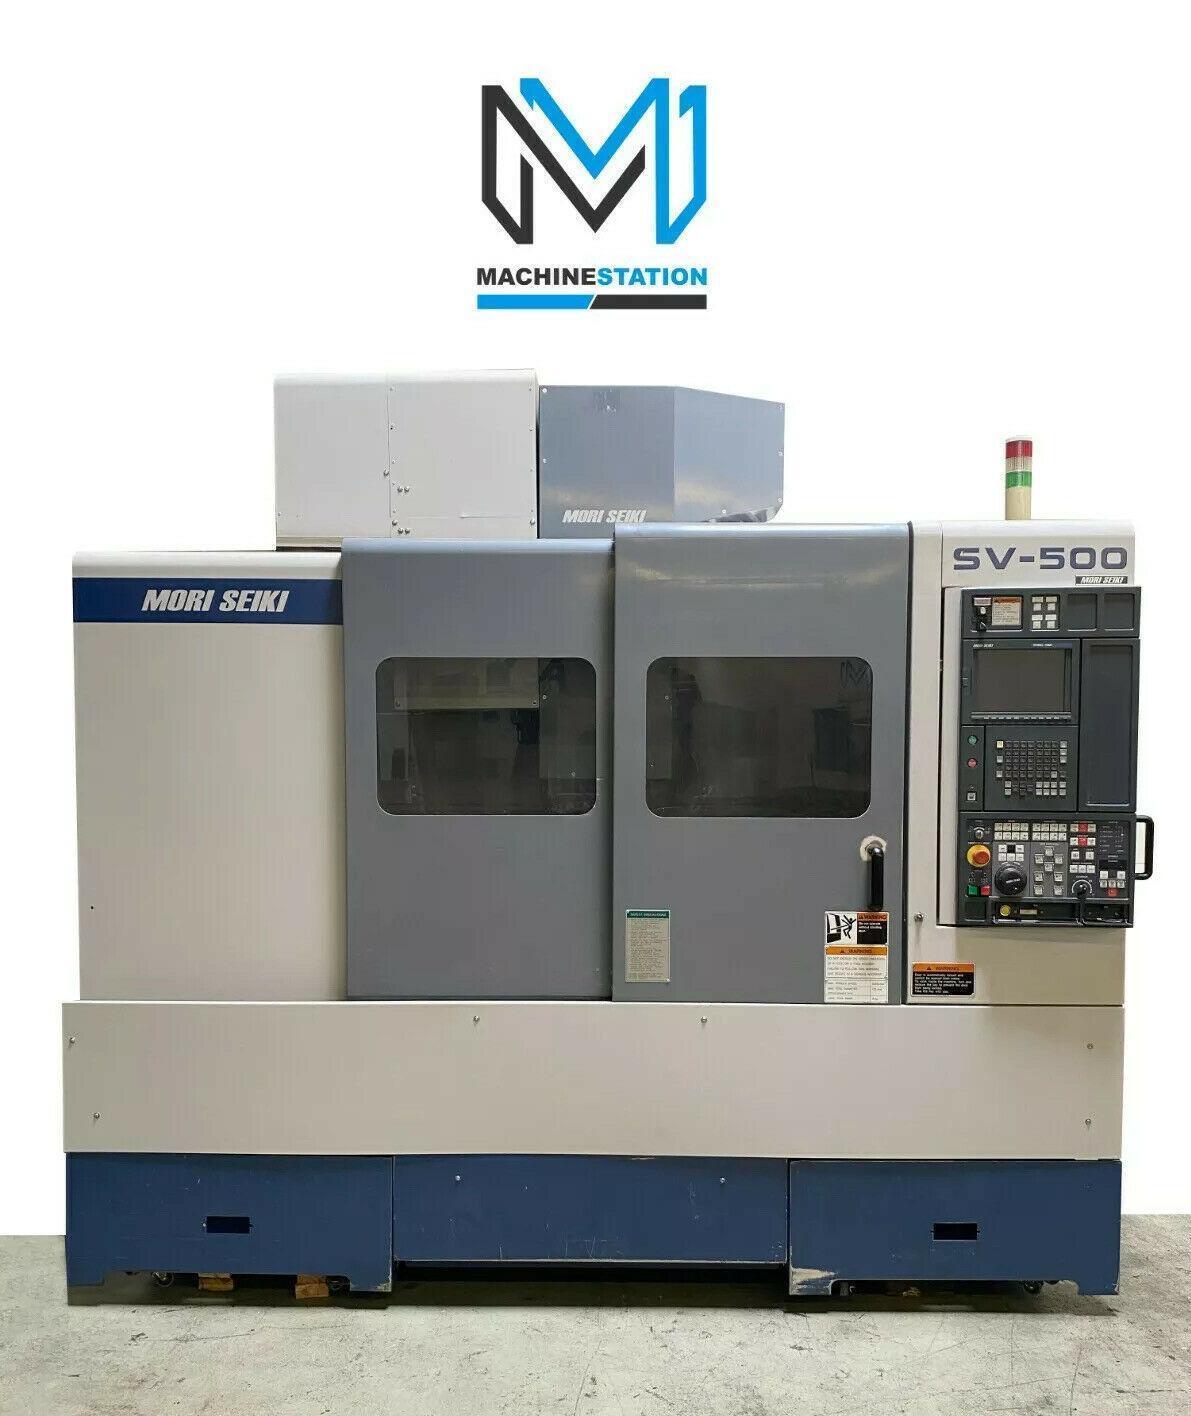 MORI SEIKI SV-500B/40 CNC VERTICAL MACHINING CENTER